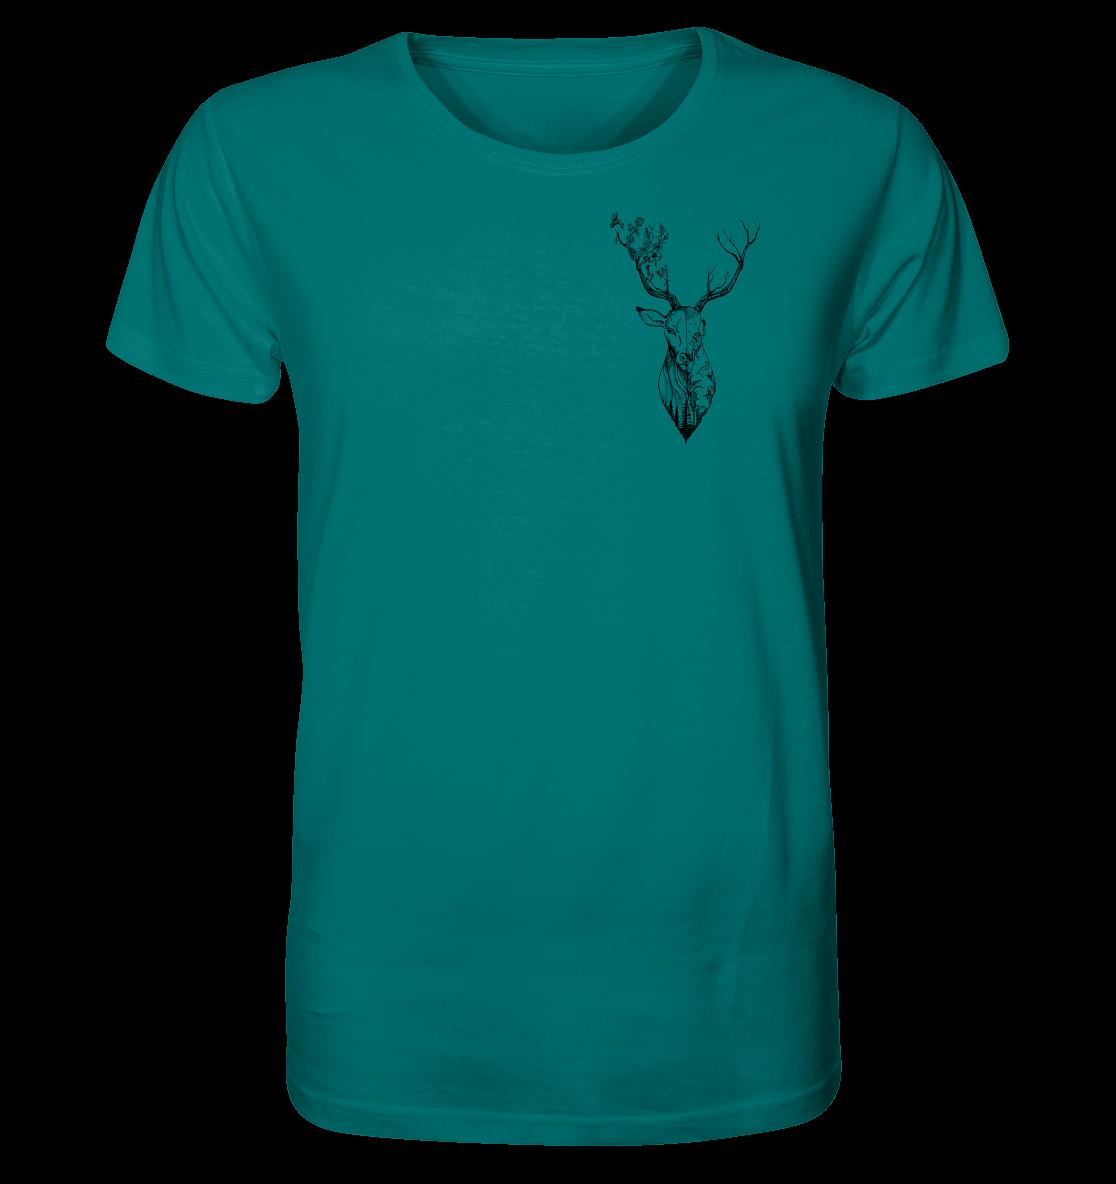 front-organic-shirt-007373-1116x-13.png